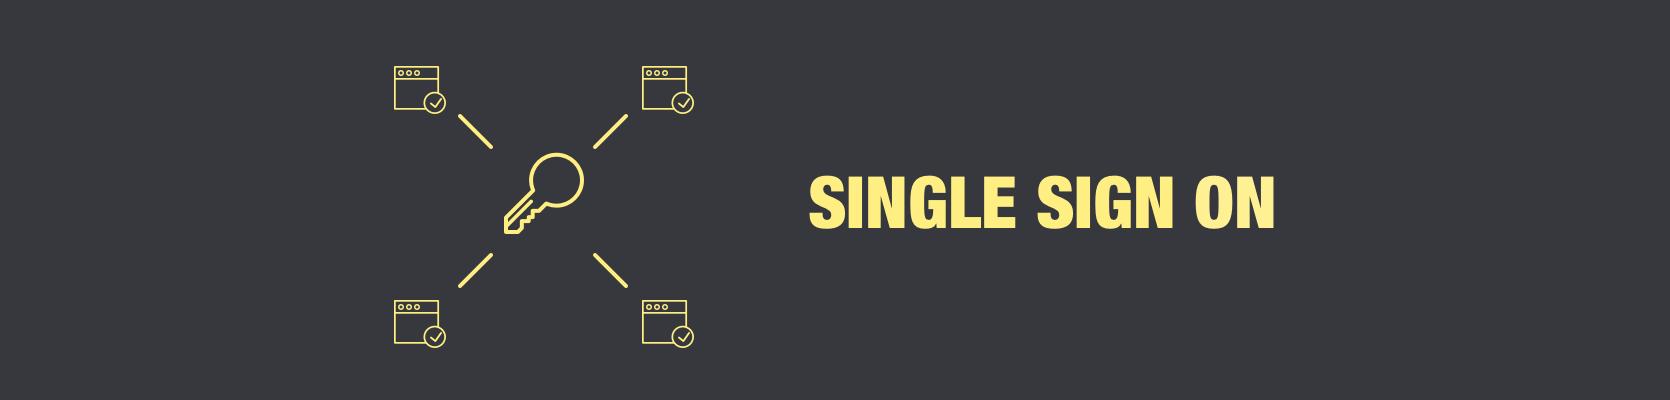 SingleSignOn Solution